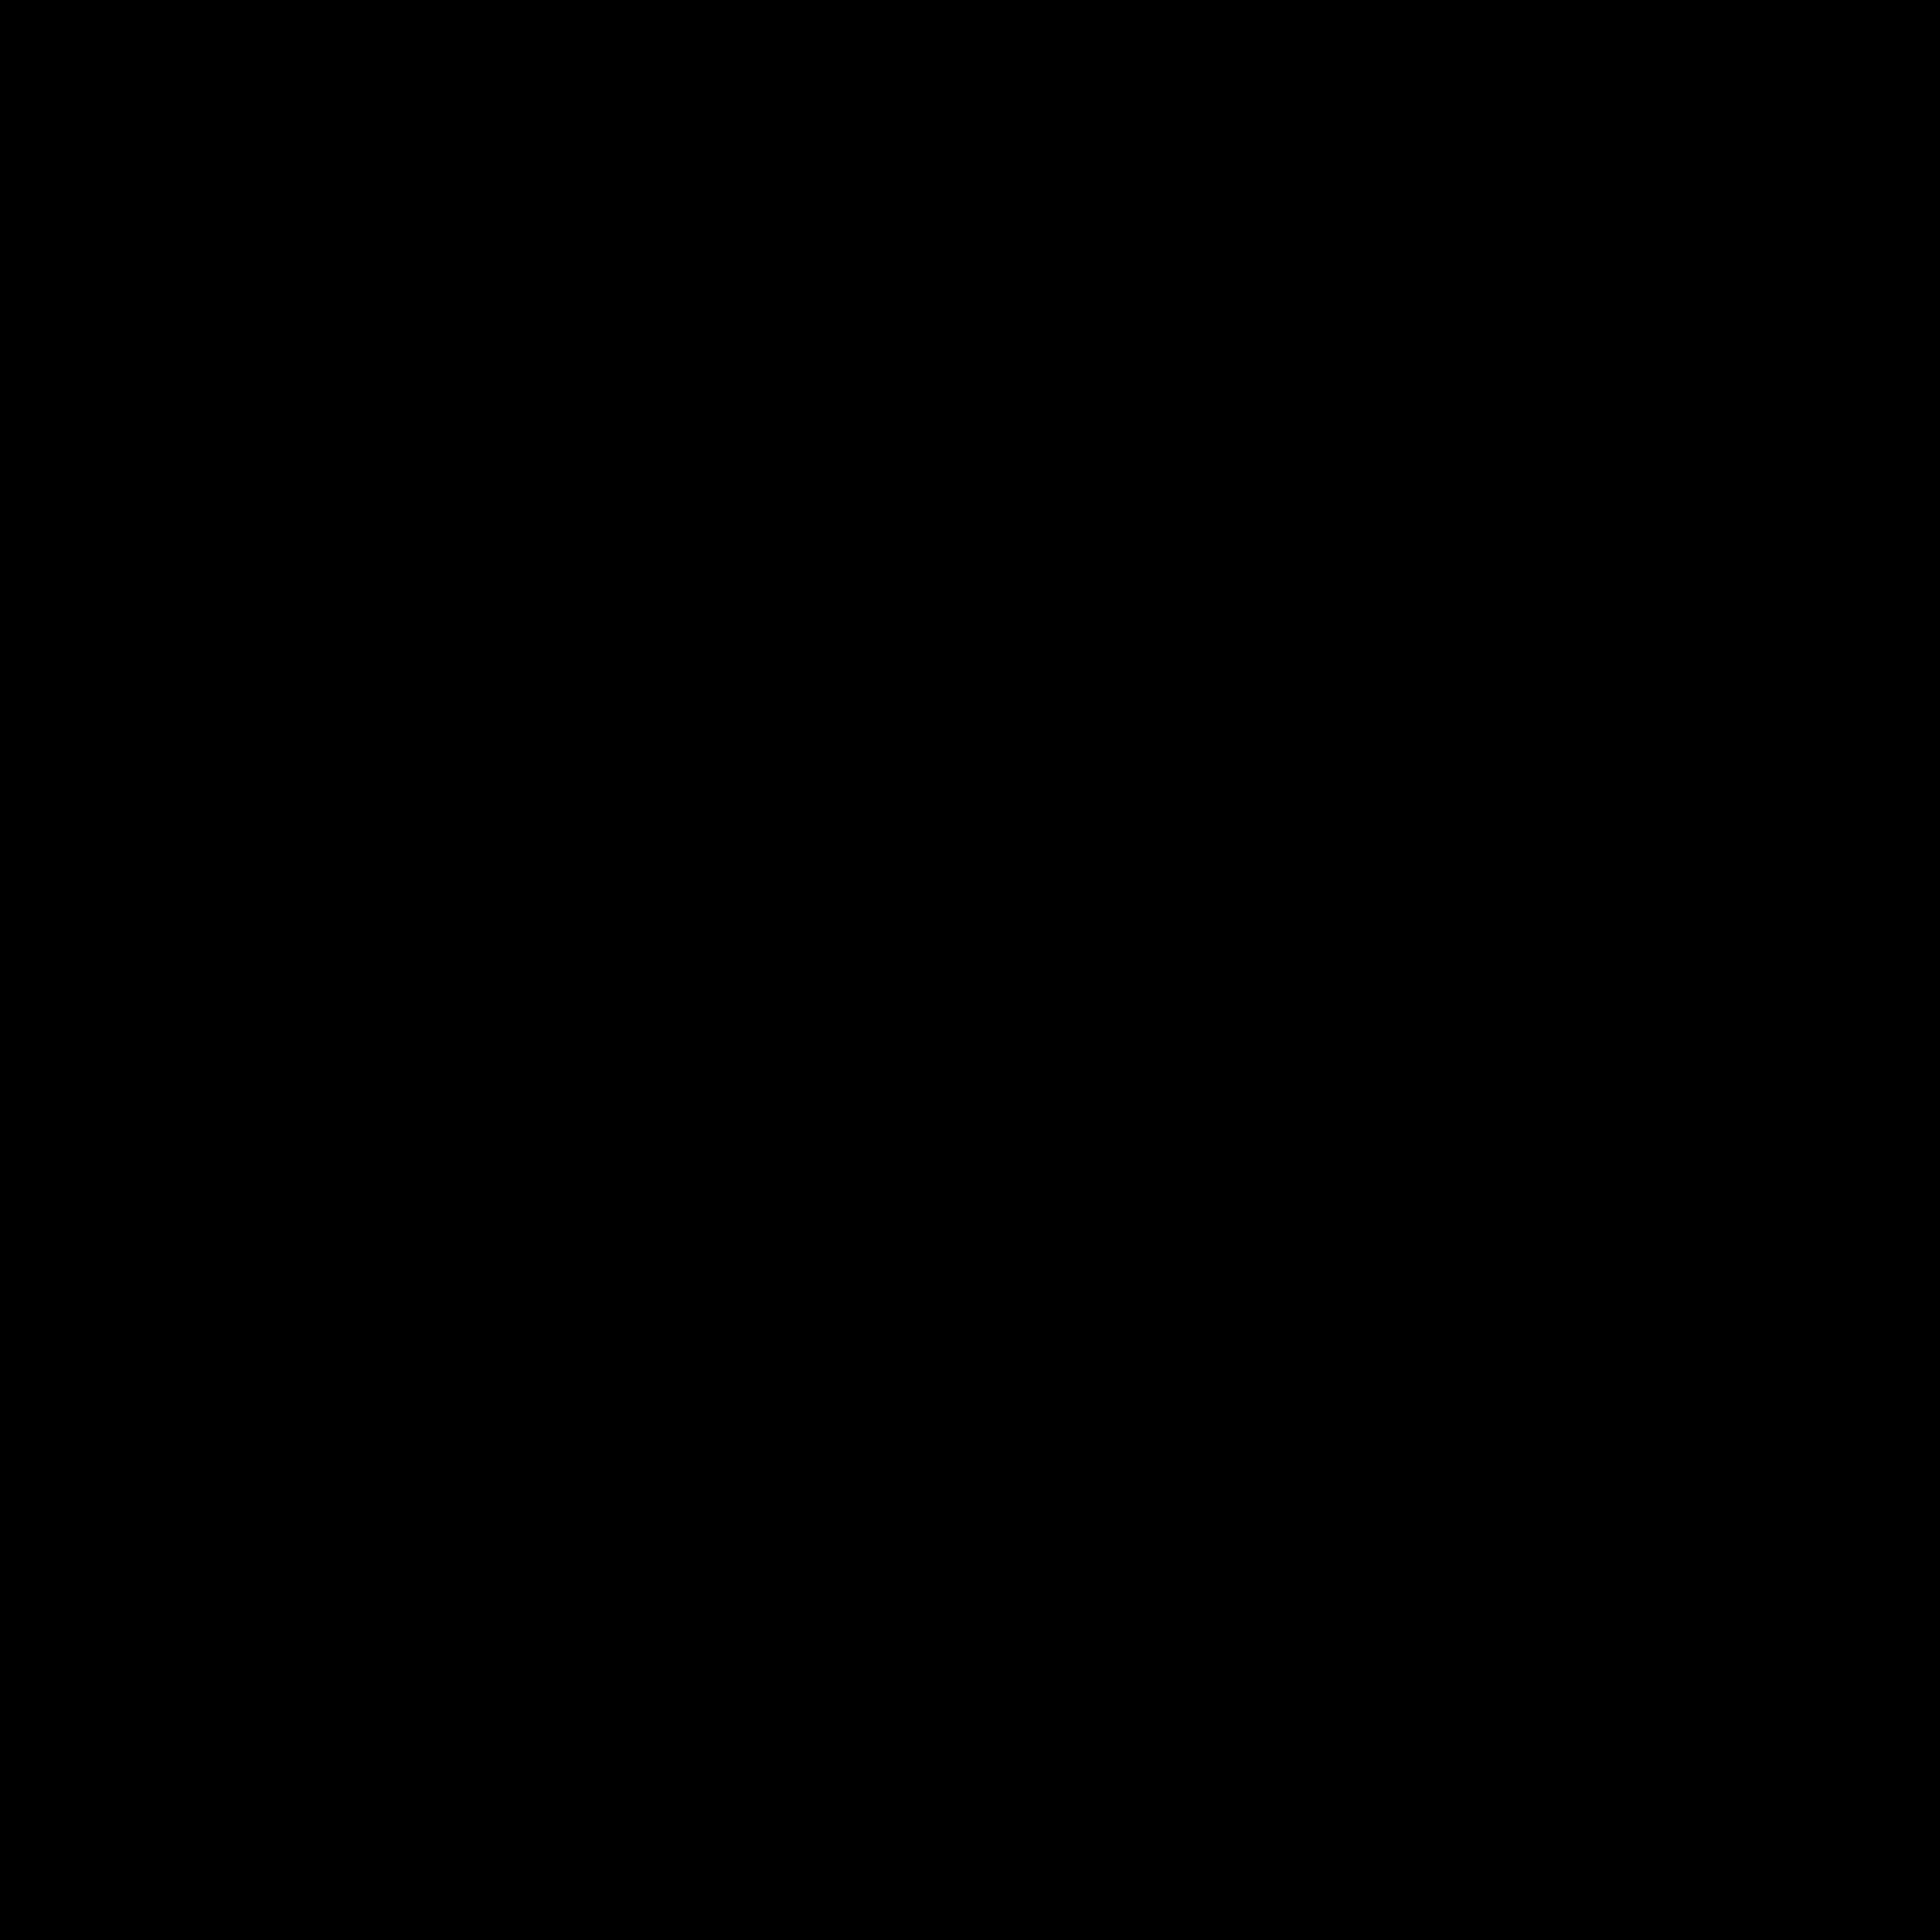 Raytheon Logo PNG Transparent & SVG Vector.